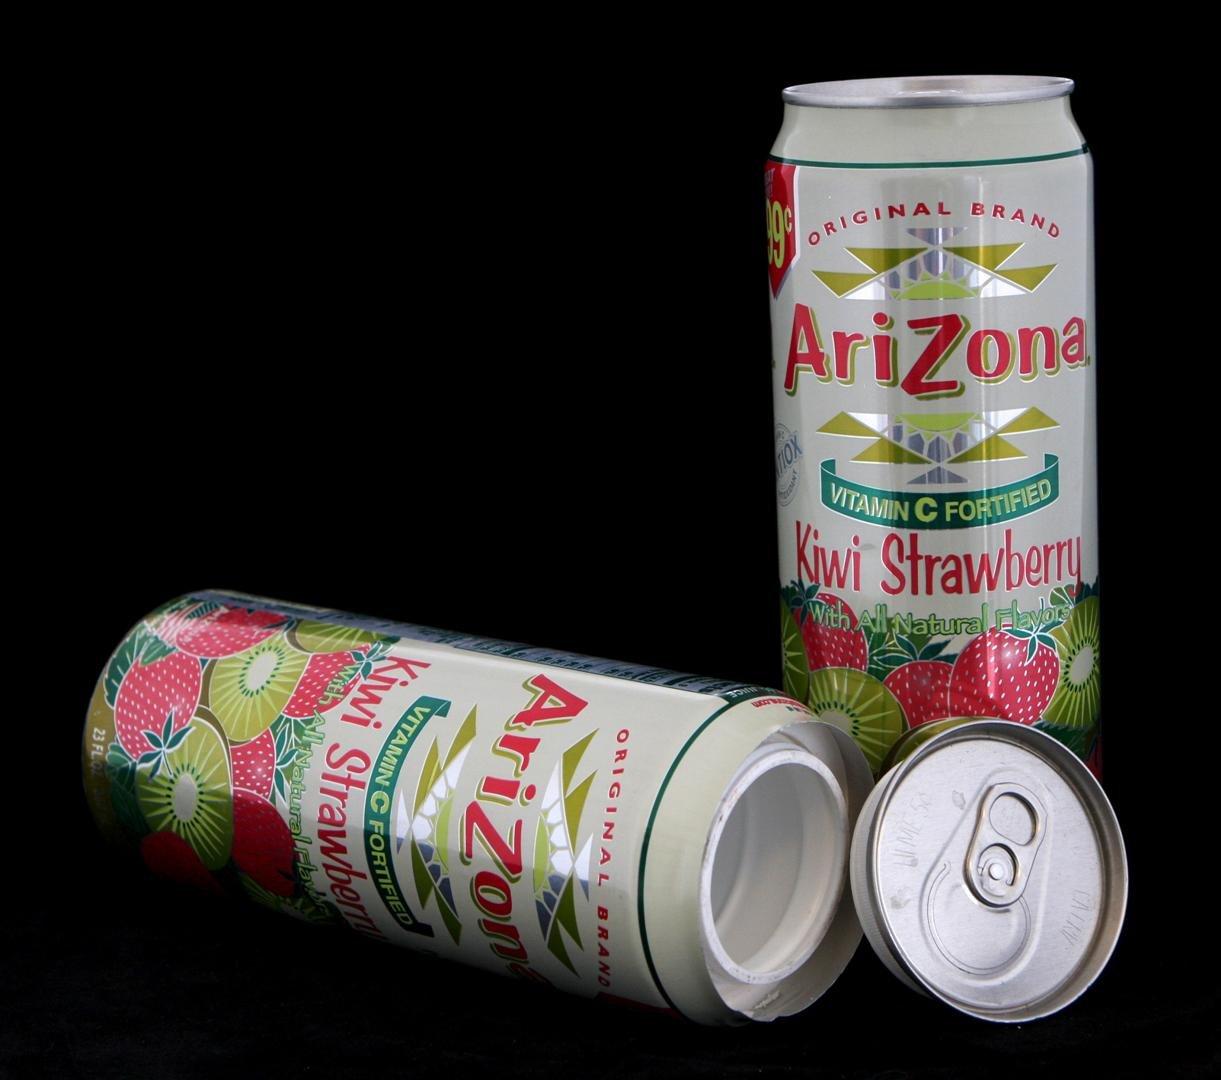 Arizona Kiwi Strawberry Diversion Safe Can Container+Free Pack of 1 1/4 Rasta Wrap